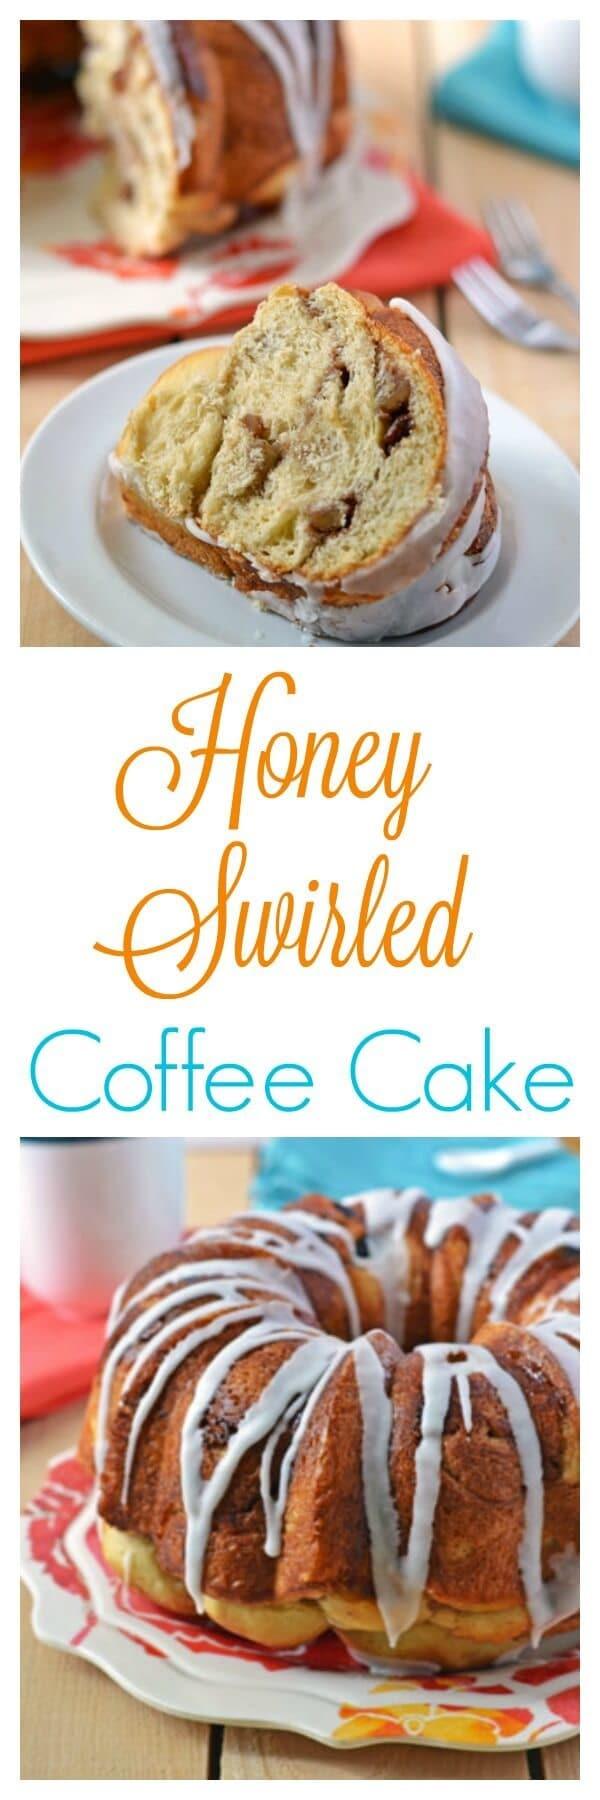 Honey Swirled Coffee Cake. The sweetest way to start your day!